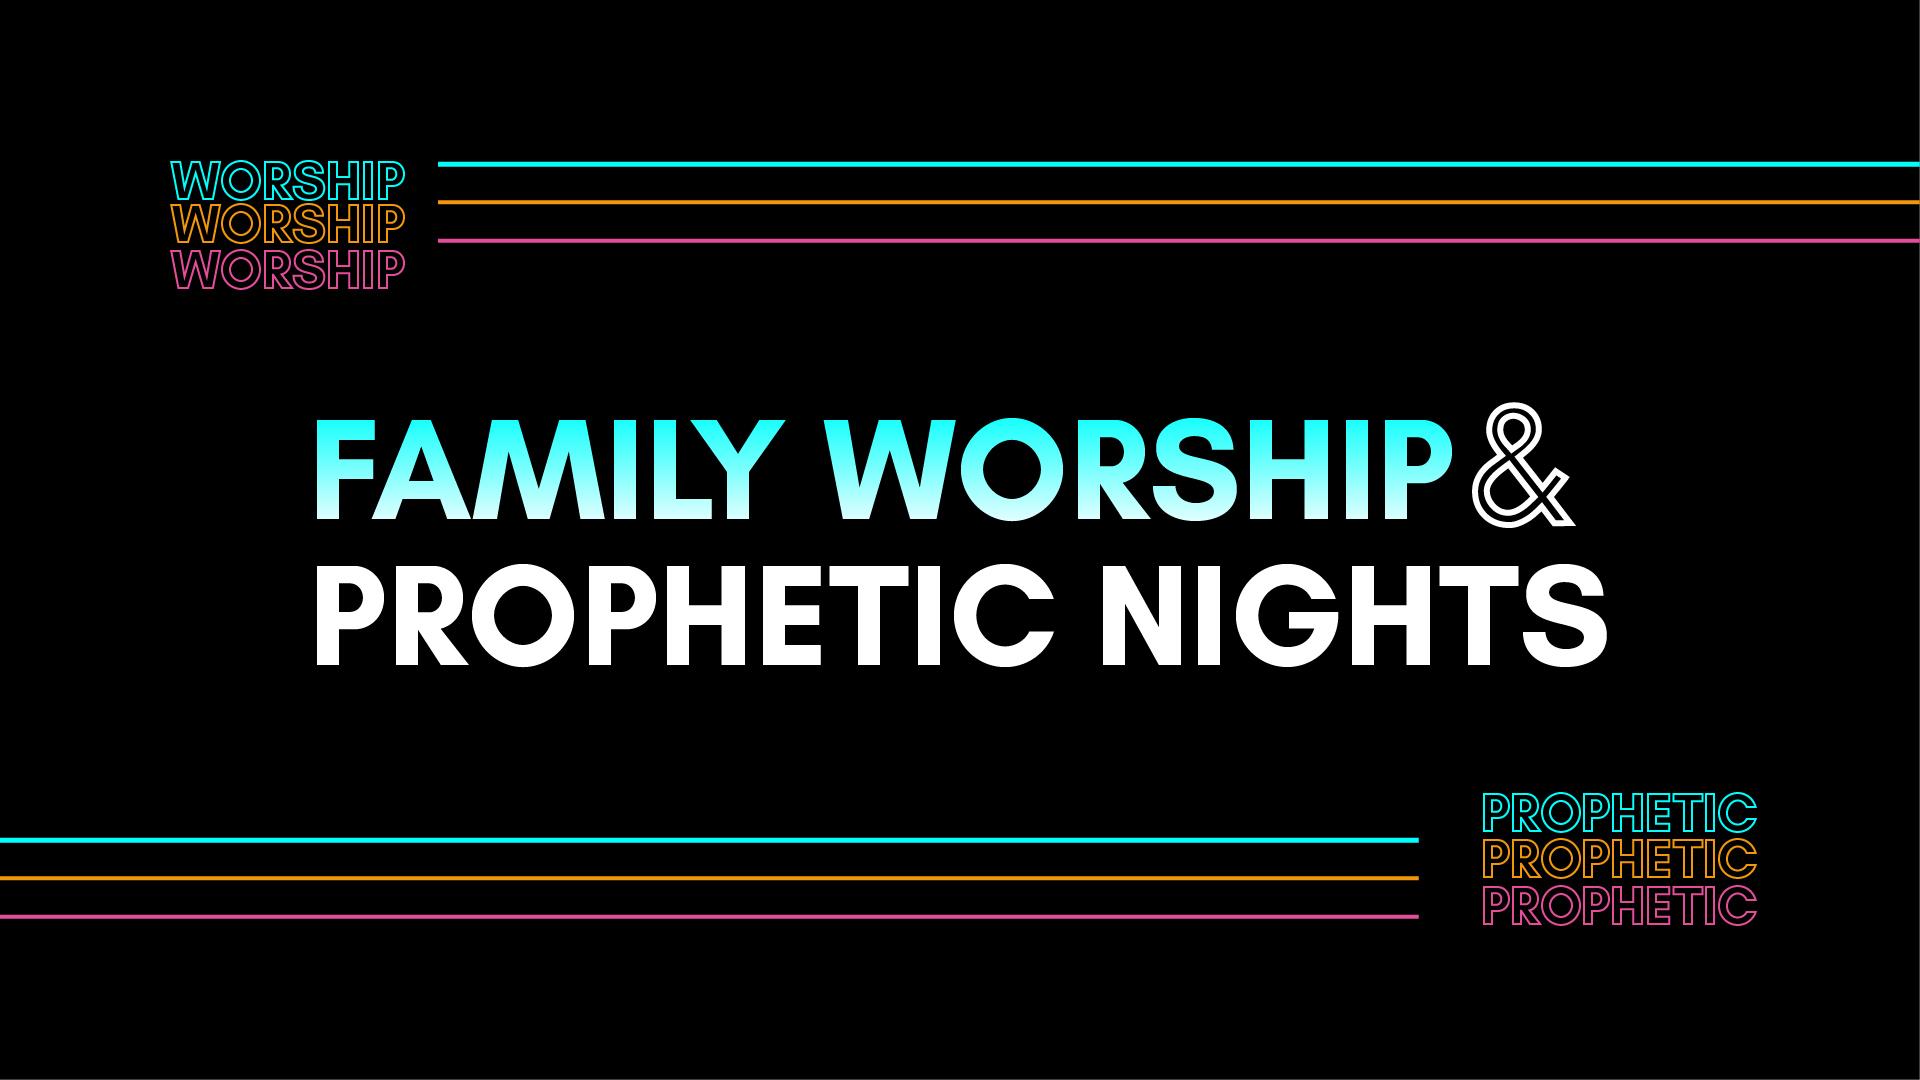 Family-Worship-Prophetic-Nights_Web-App-1.jpg?mtime=20200430122453#asset:226832